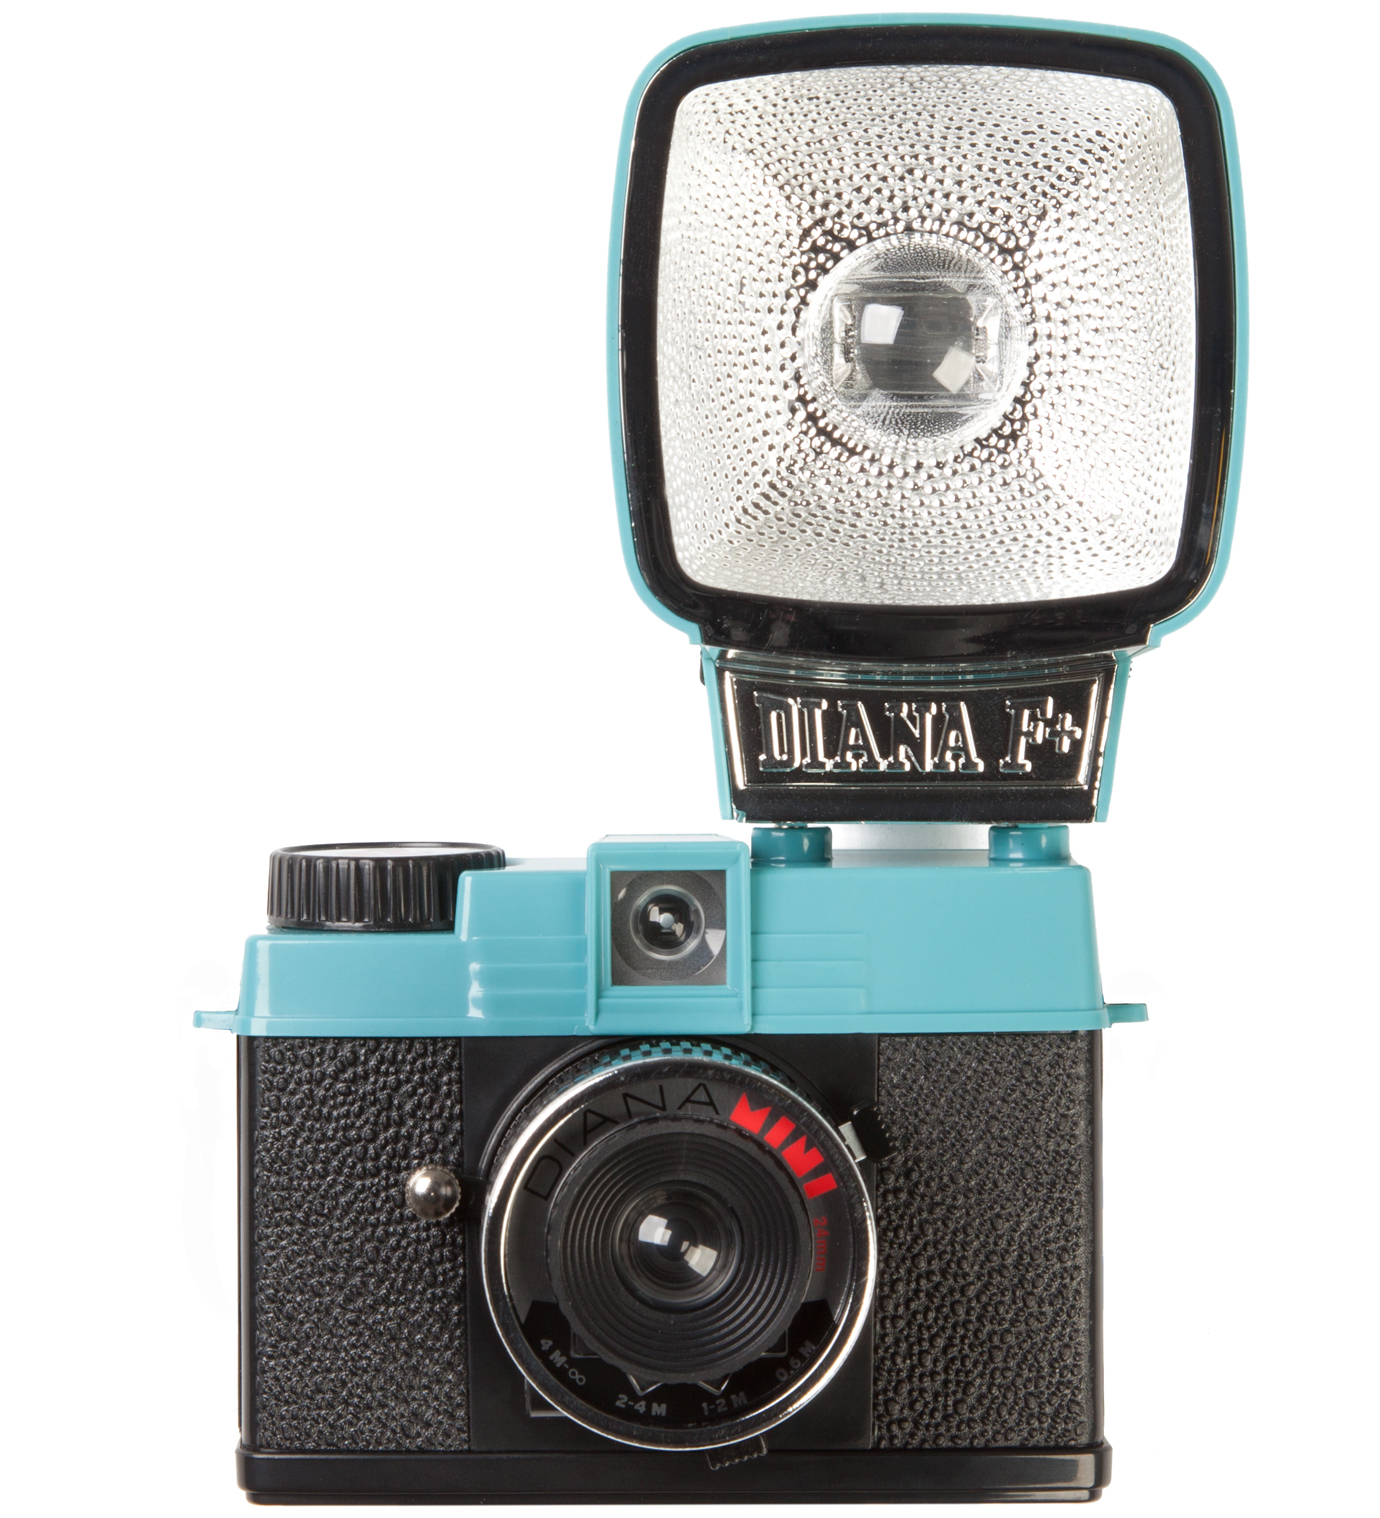 Lomography Diana Mini & Flash Package